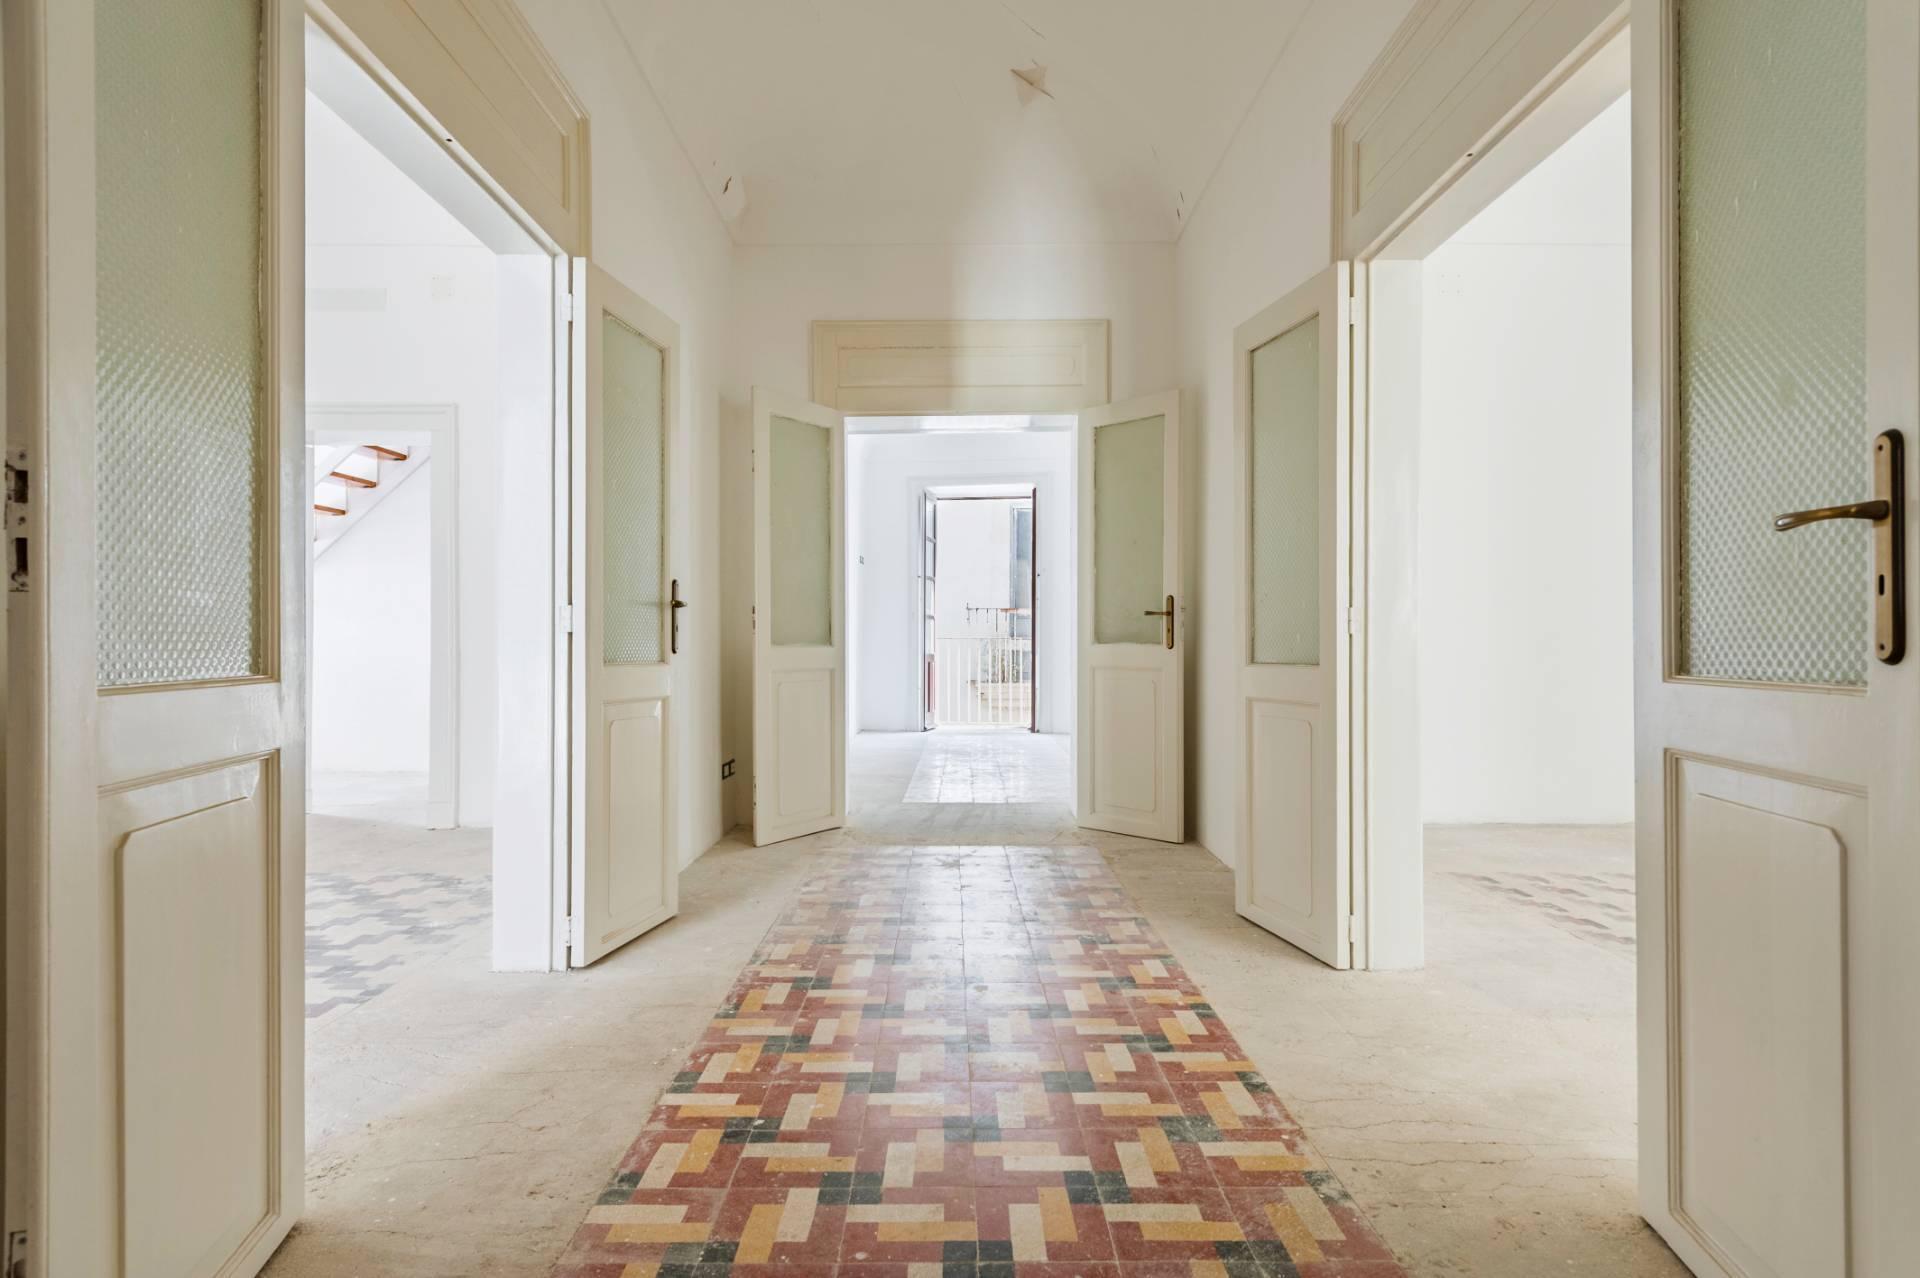 Palazzo in Vendita a Siracusa: 5 locali, 500 mq - Foto 4